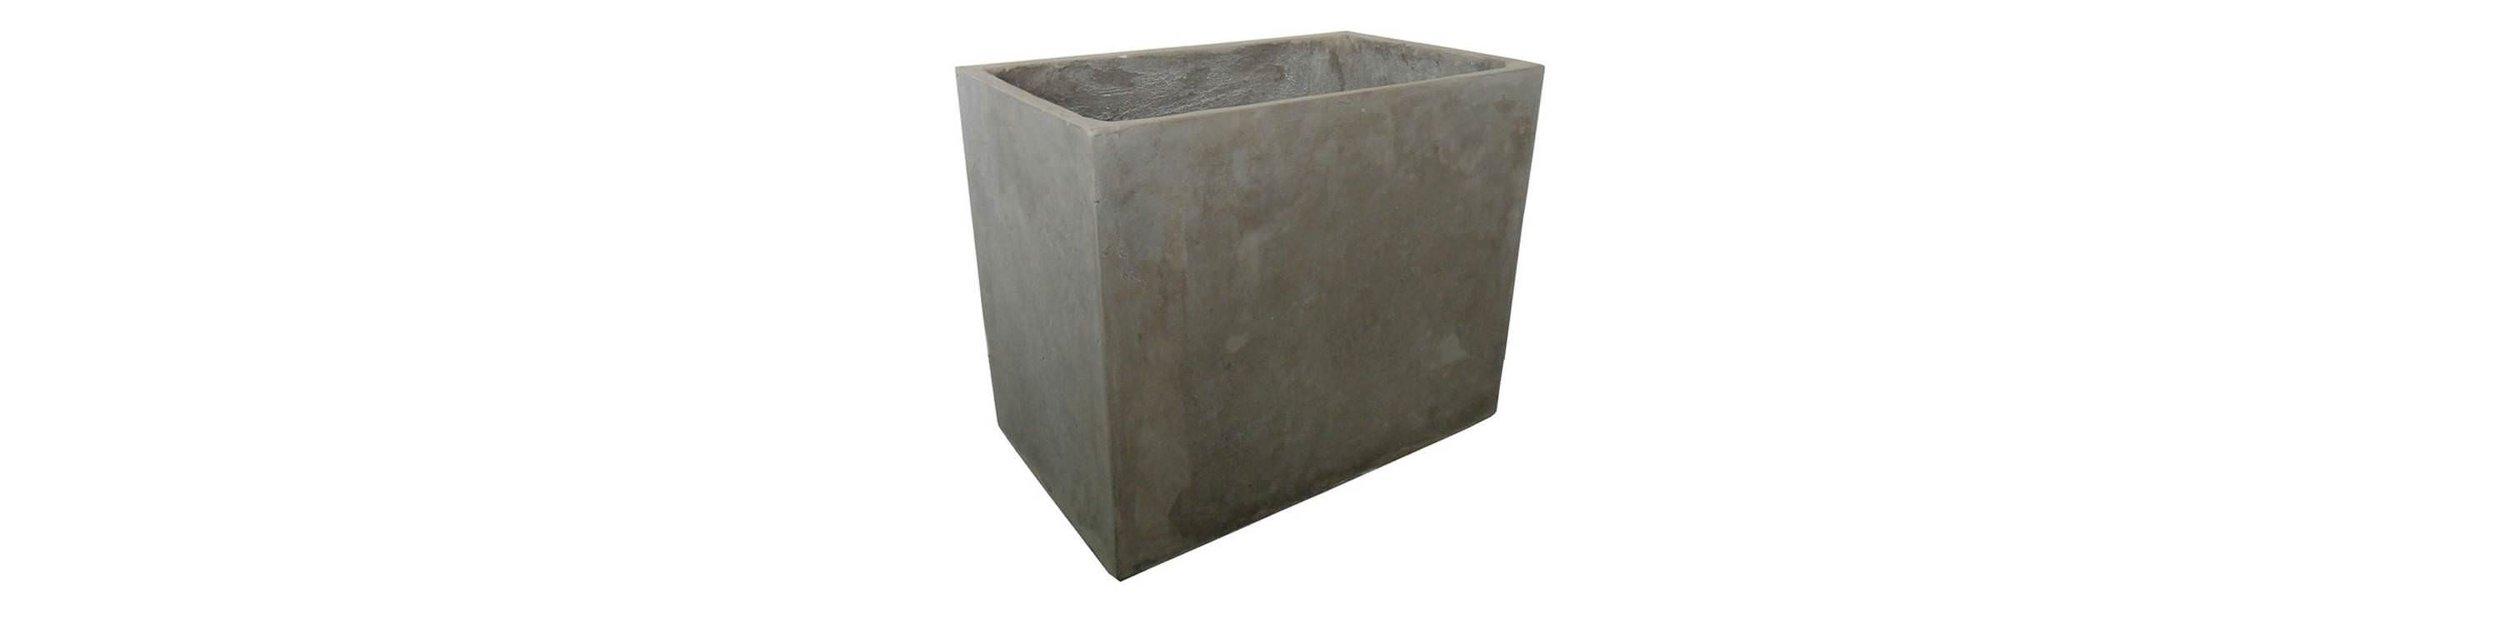 pot-concrete-rectangle.jpeg